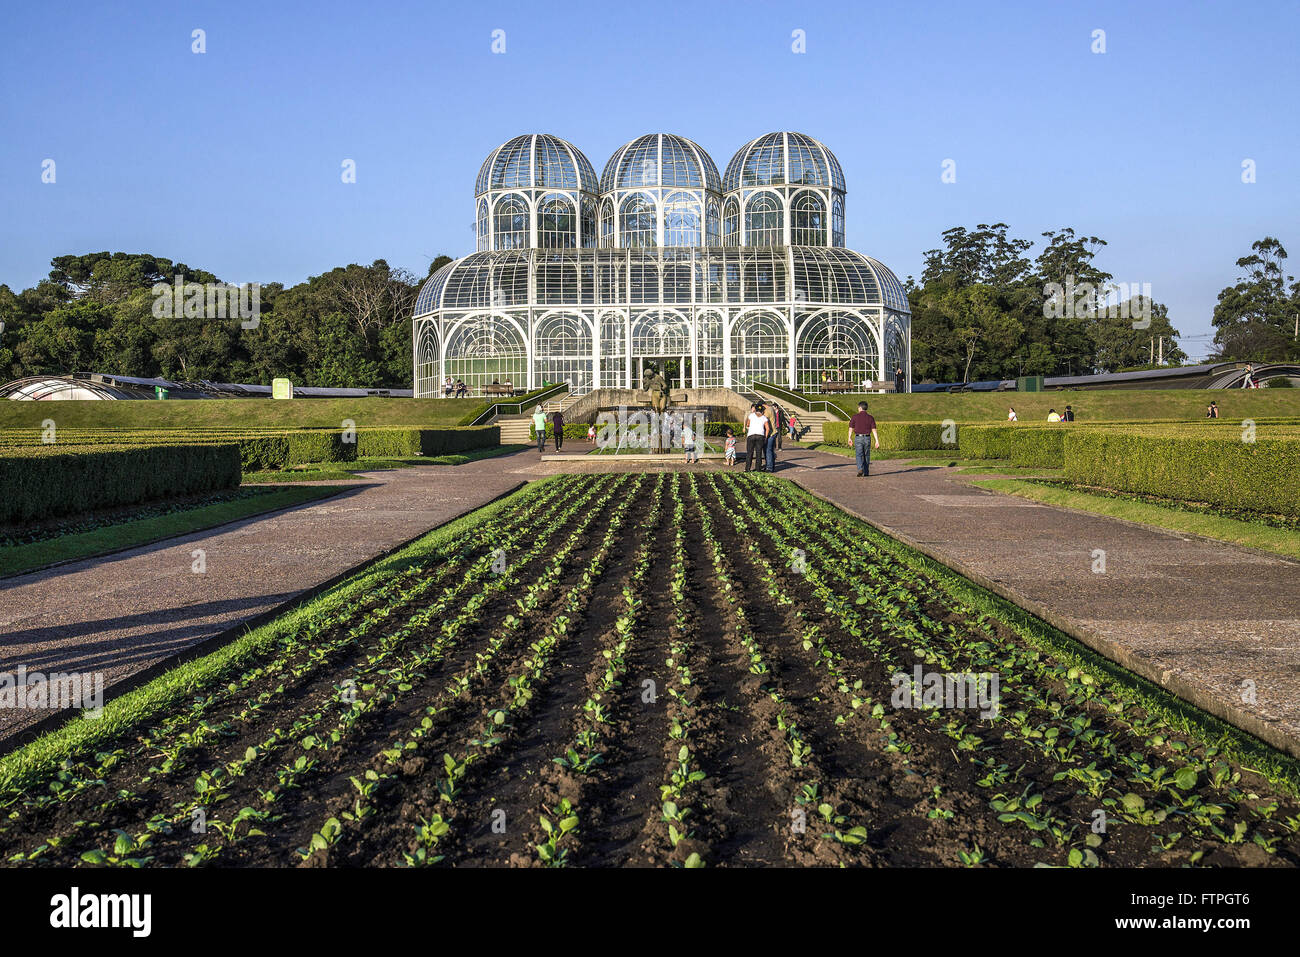 Jardim Botanico de Curitiba officially named Maria Jardim Botanico Garfunkel Richbieter - Stock Image